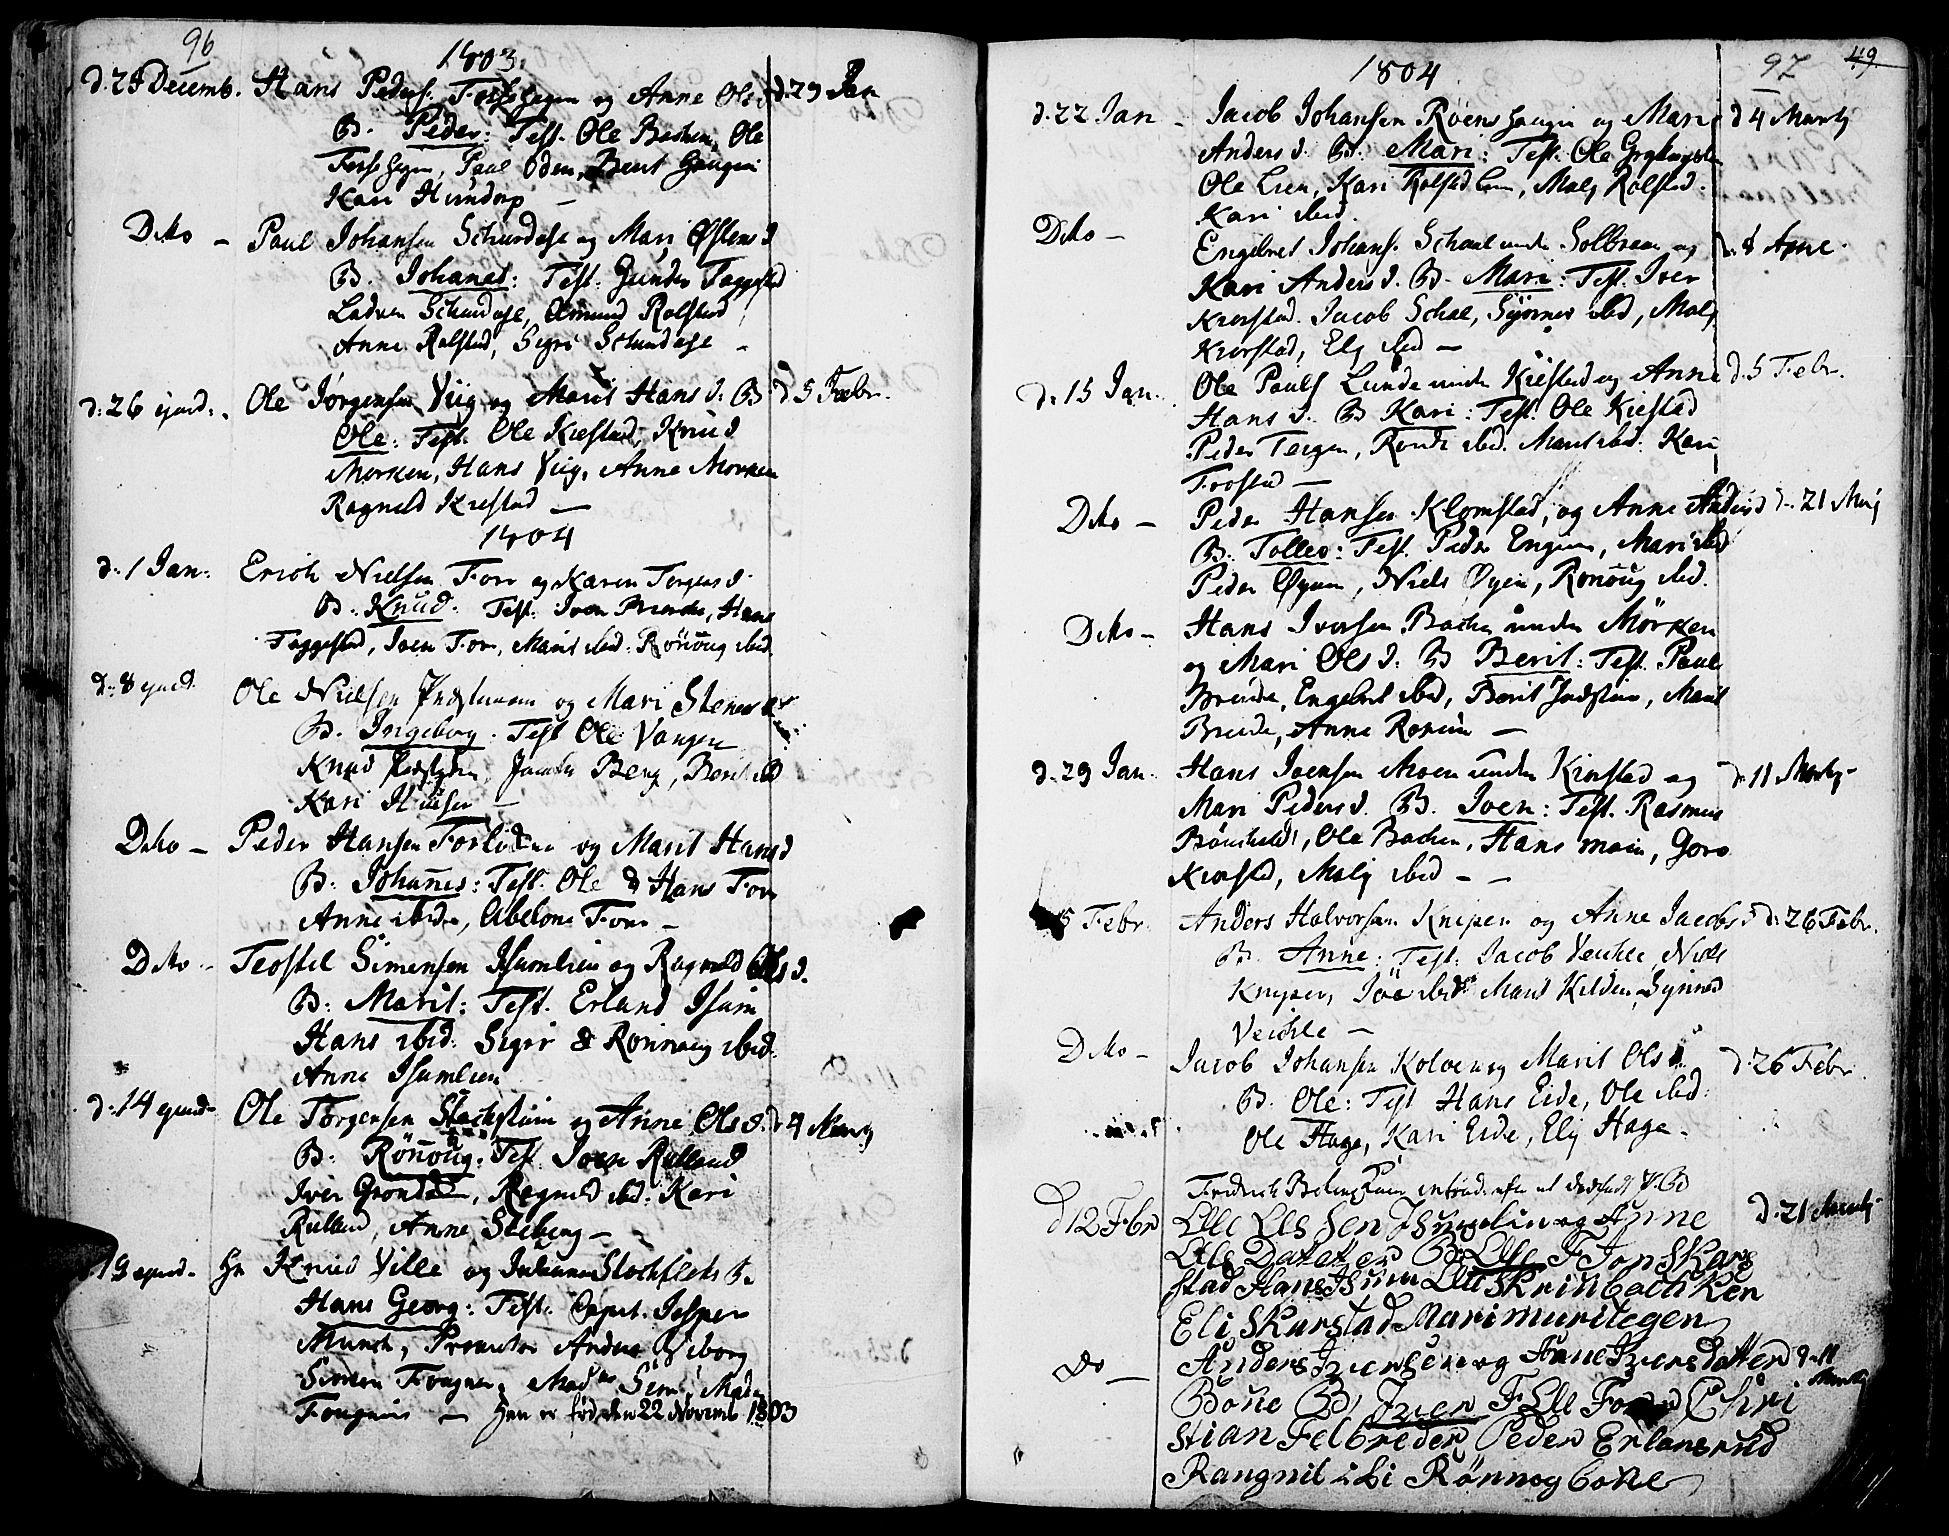 SAH, Fron prestekontor, H/Ha/Haa/L0001: Ministerialbok nr. 1, 1799-1816, s. 96-97